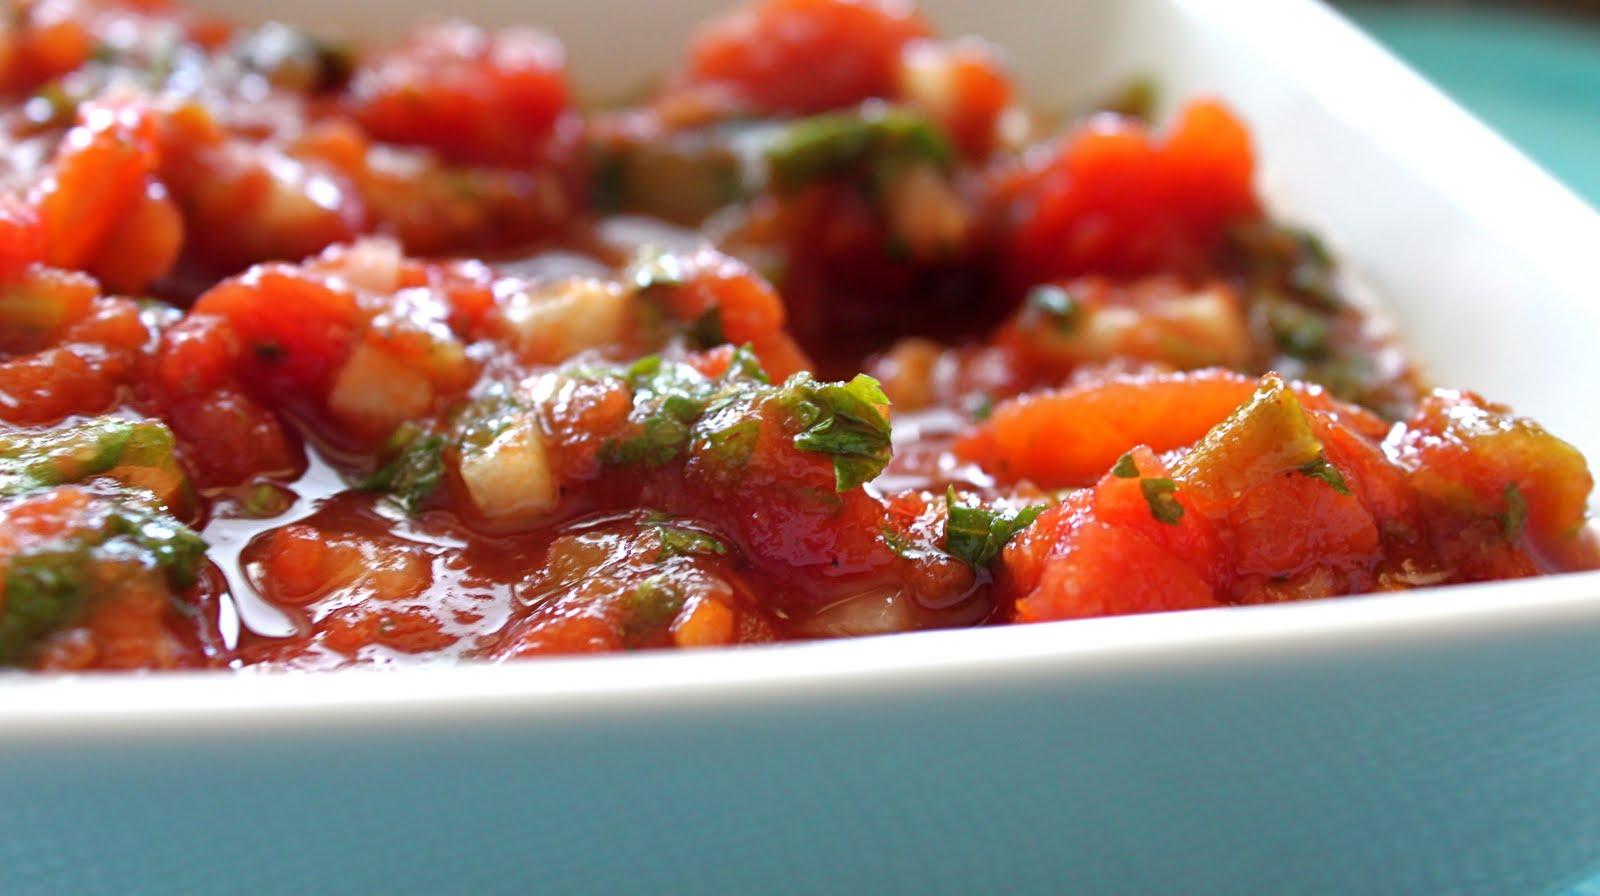 Bountiful Kitchen: Sheri's Super Simple Salsa